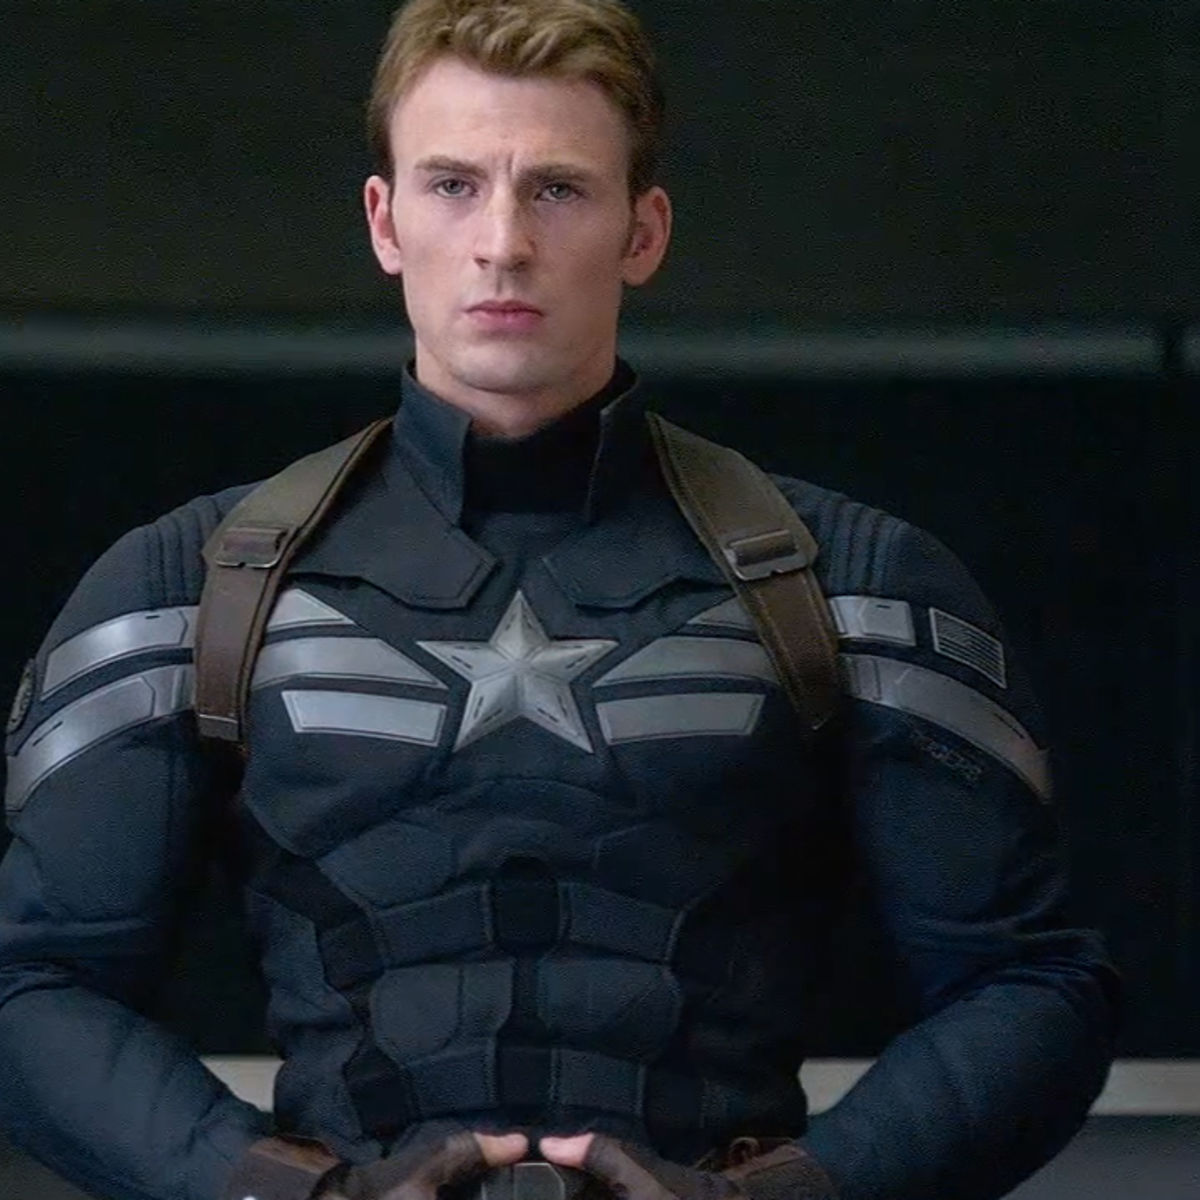 Captain America Winter Soldier.jpg